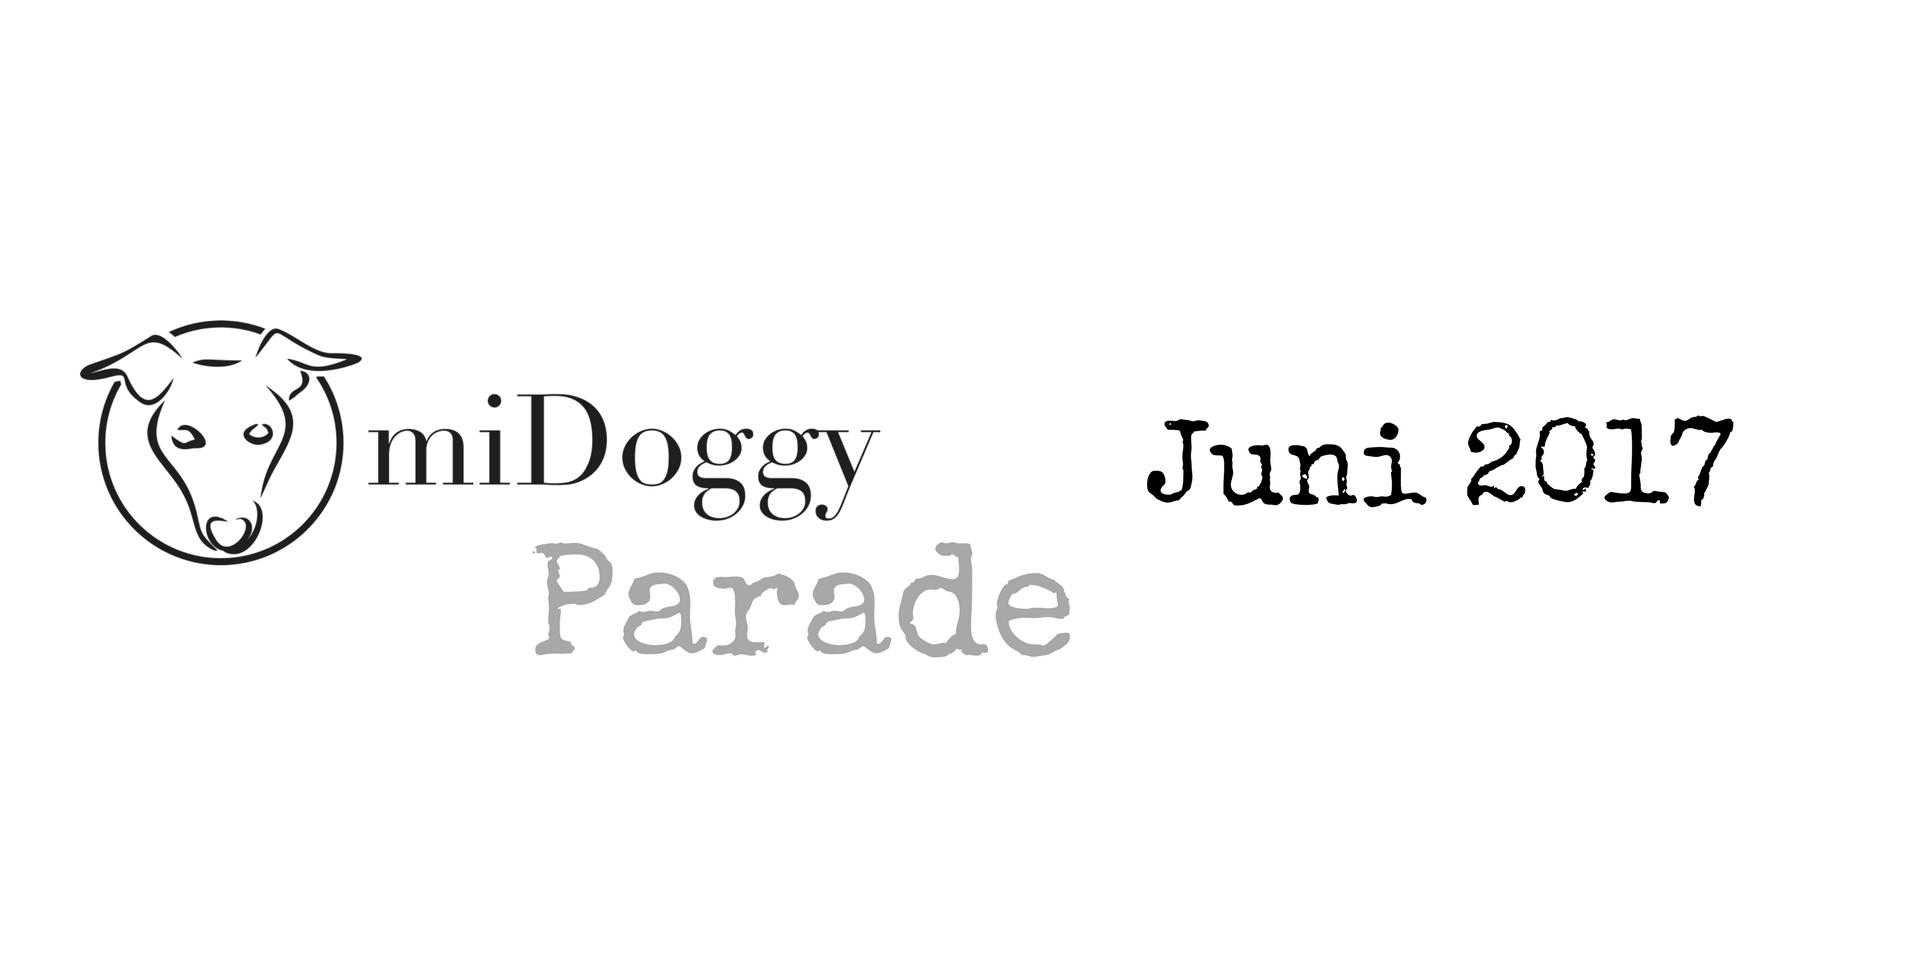 miDoggy Parade Blogparade Hundeblogger Juni 2017